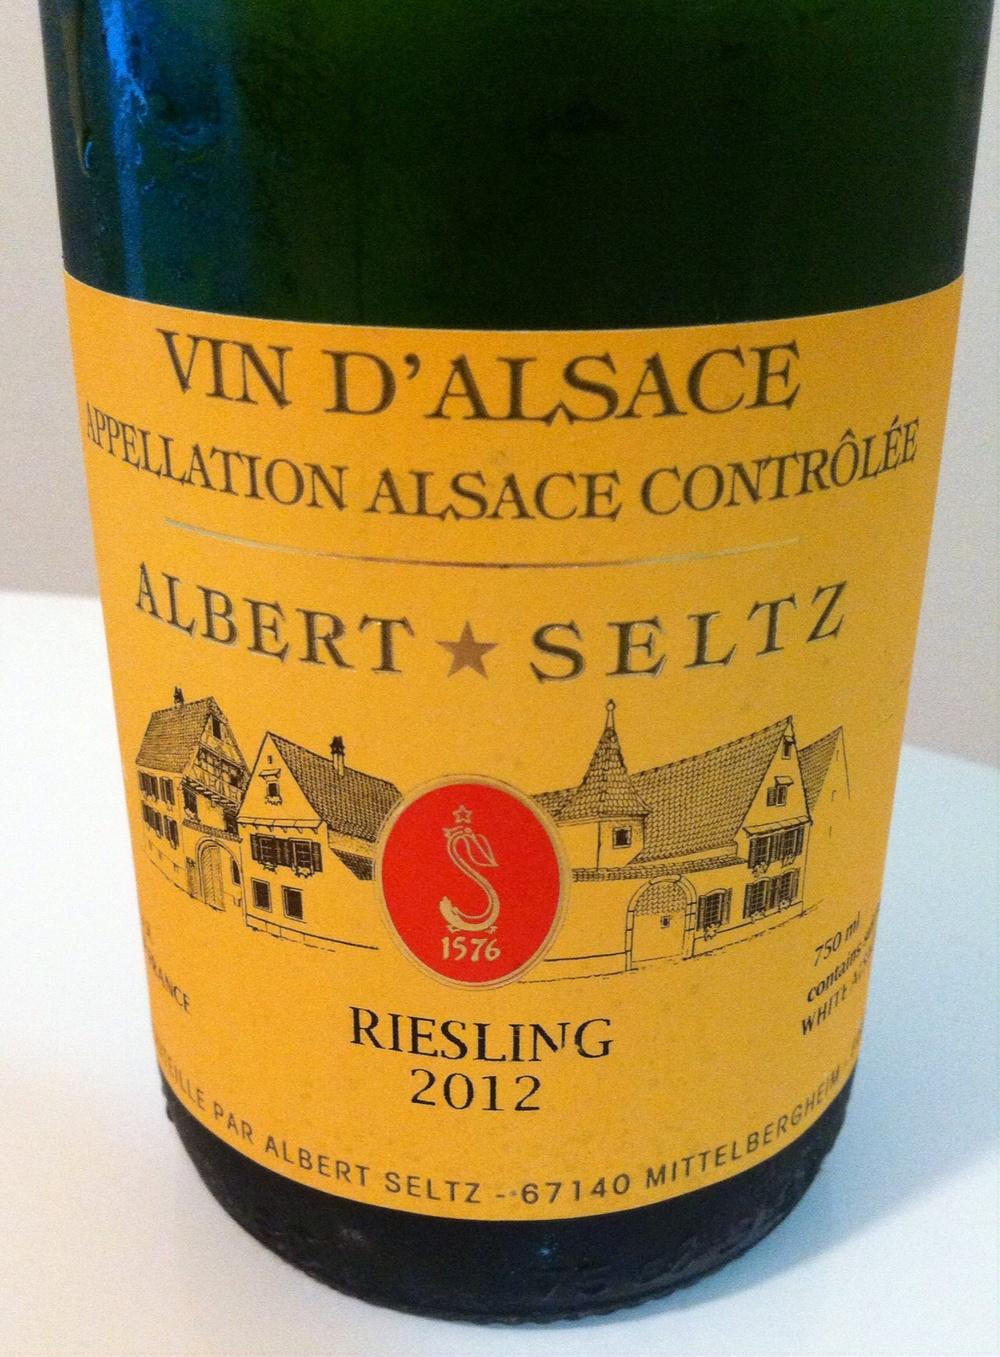 Albert Seltz, Riesling Reserve, Alsace, 2012. Photo by Shana Sokol, Shana Speaks Wine.